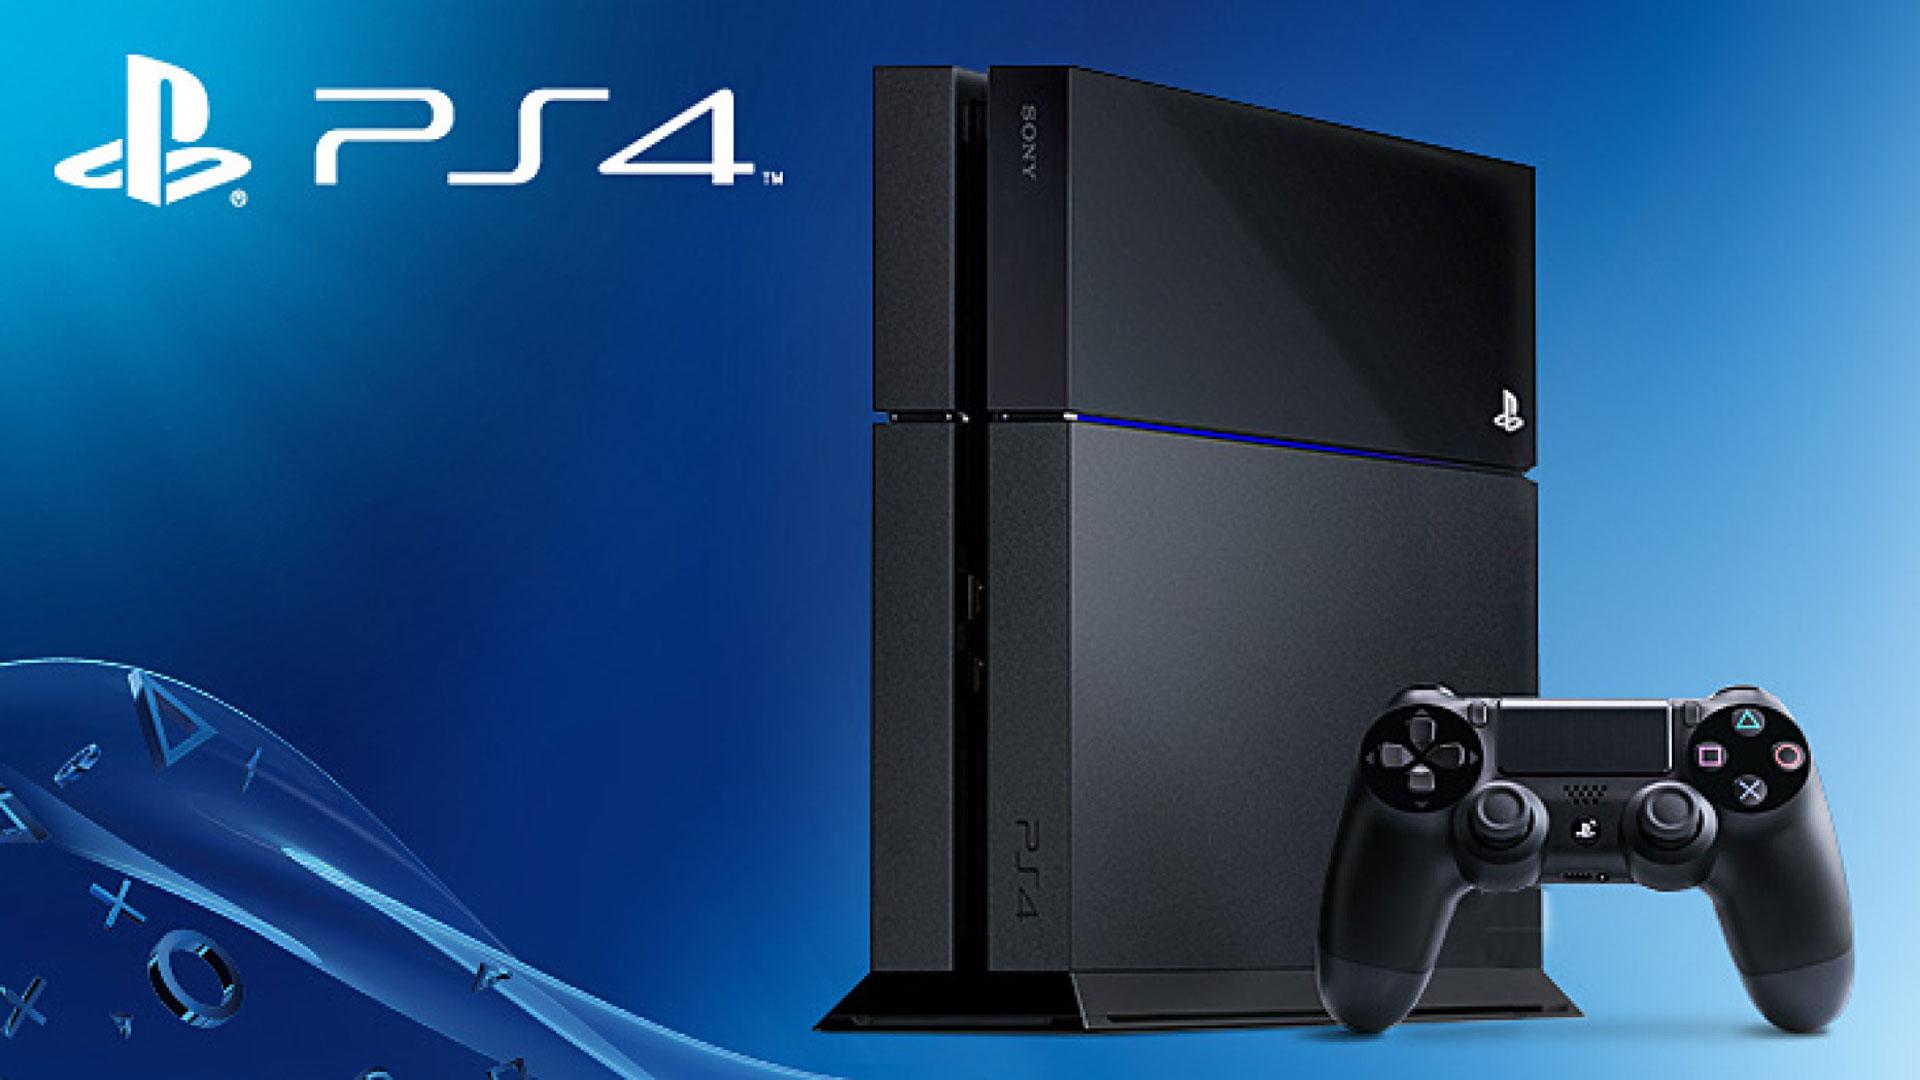 Sony anuncia: Playstation 4 será fabricado no Brasil